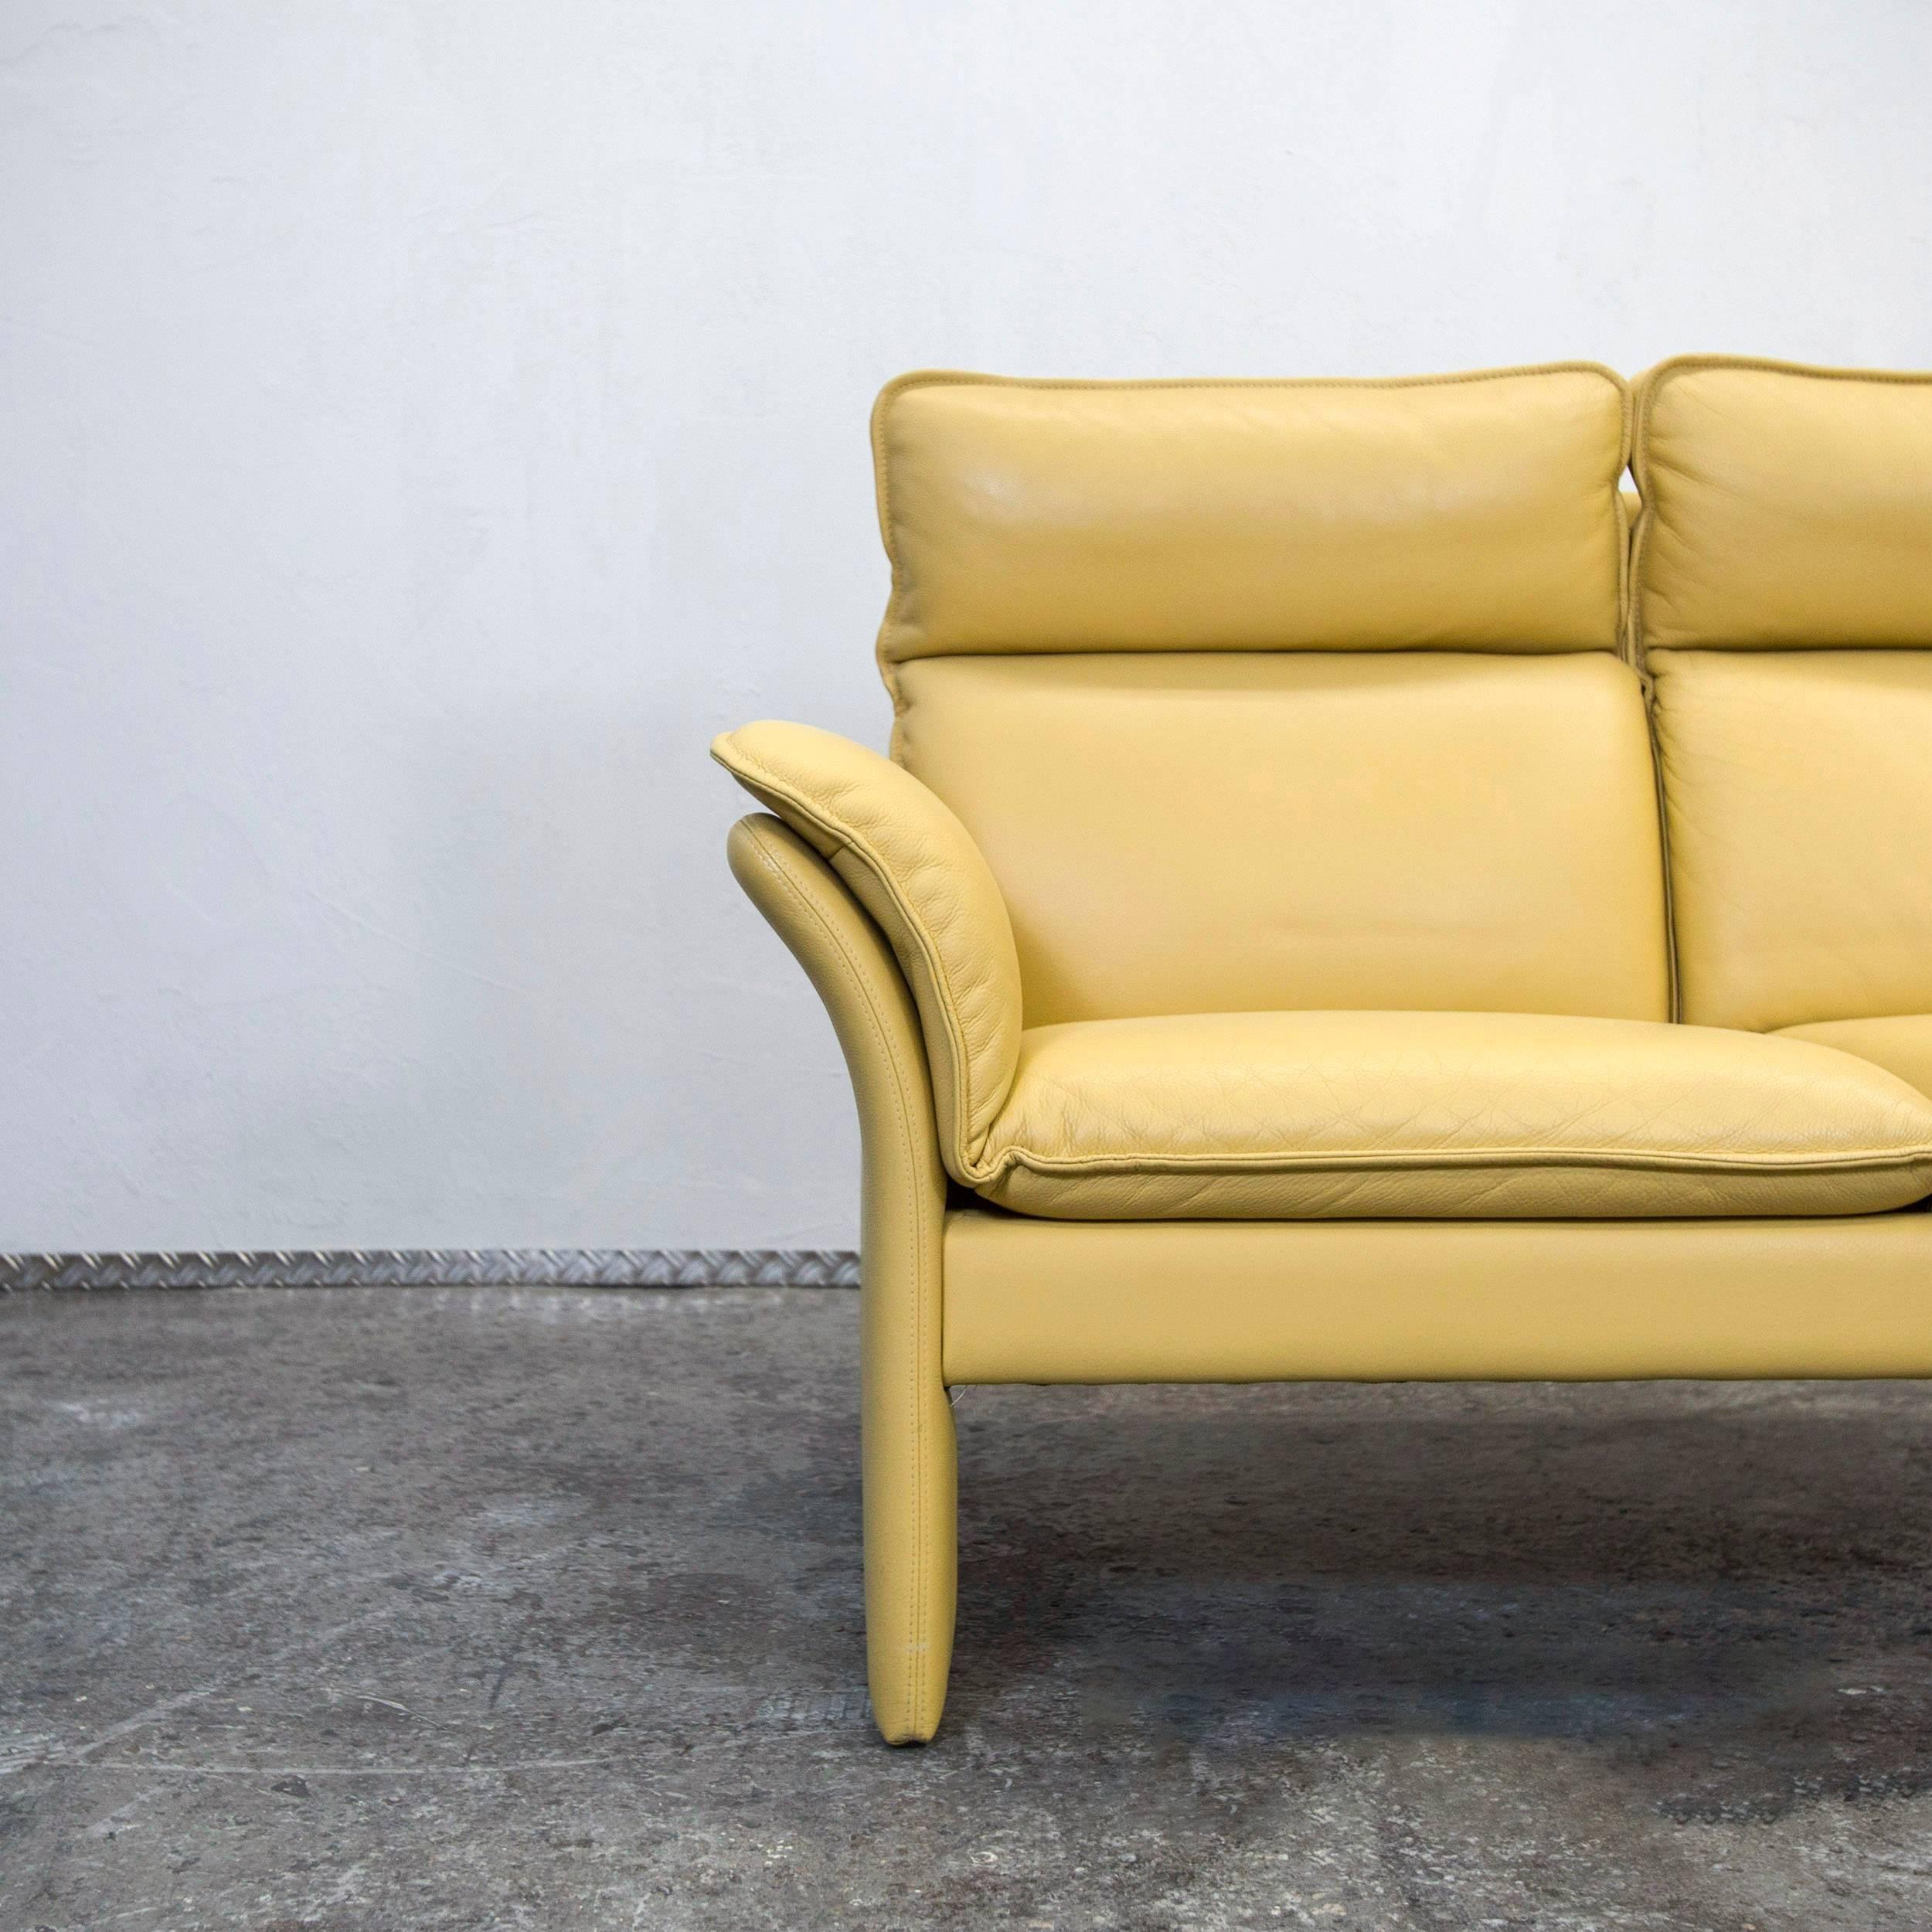 Dreipunkt Designer Leather Sofa Mustard Yellow Two Seat Couch Modern 2